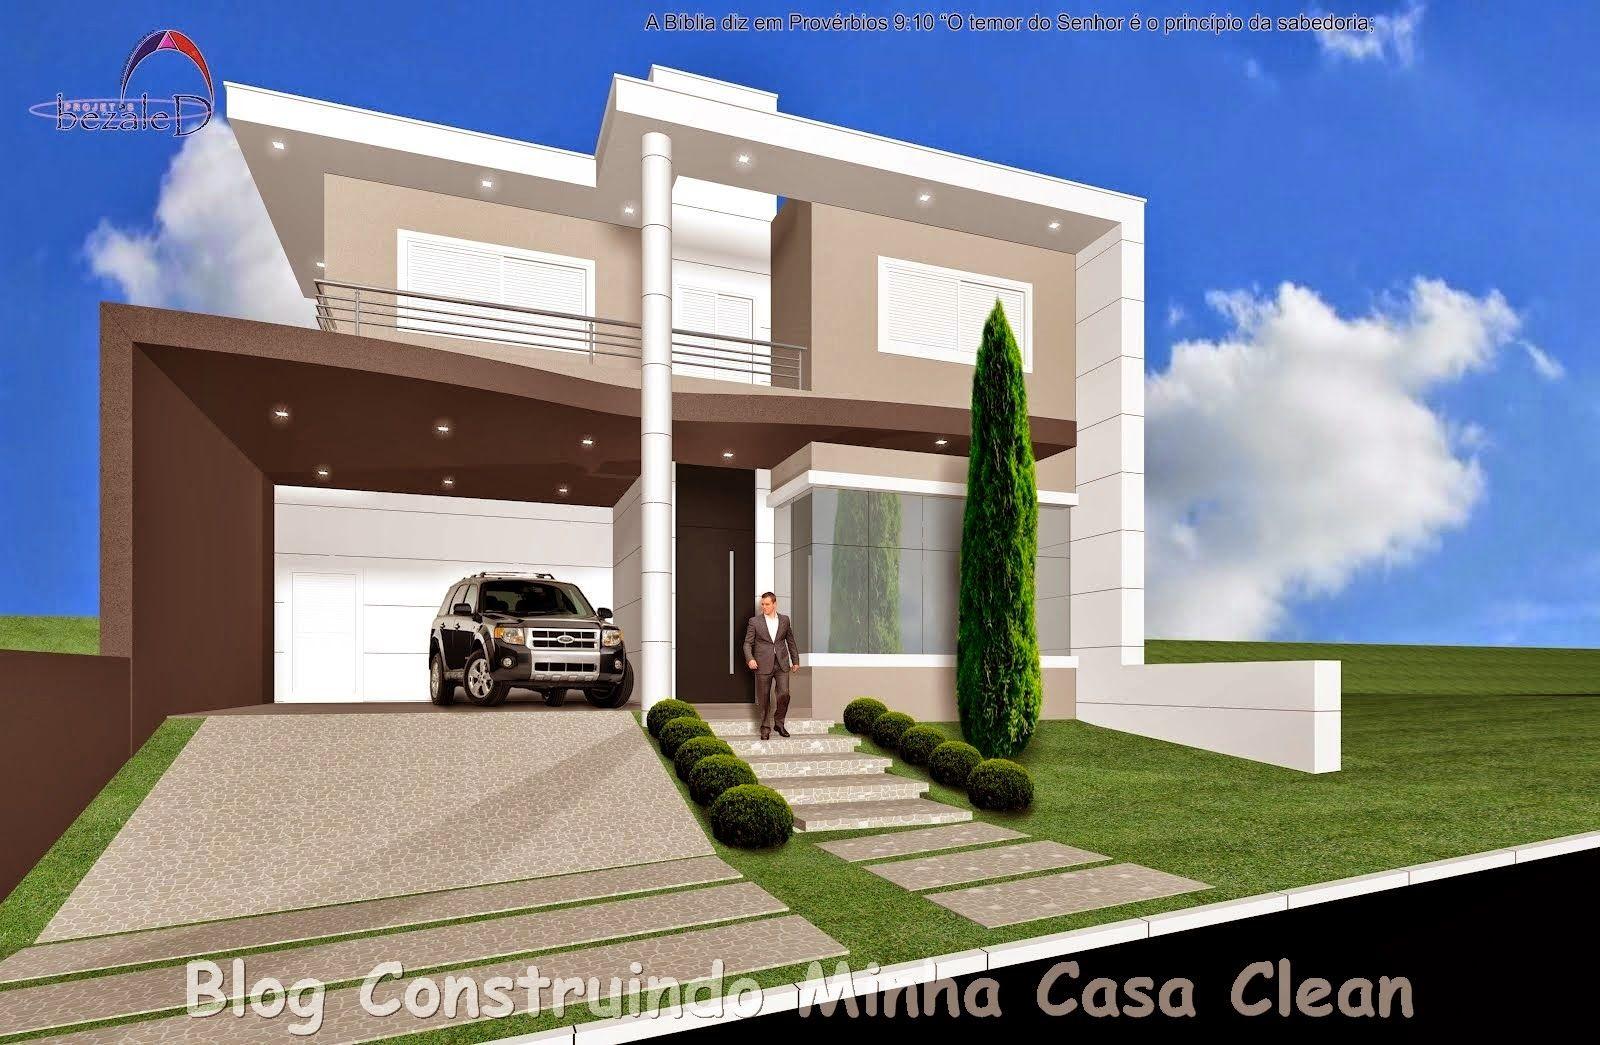 Top 10 Fachadas De Casas Modernas Com Paisagismo E Muros